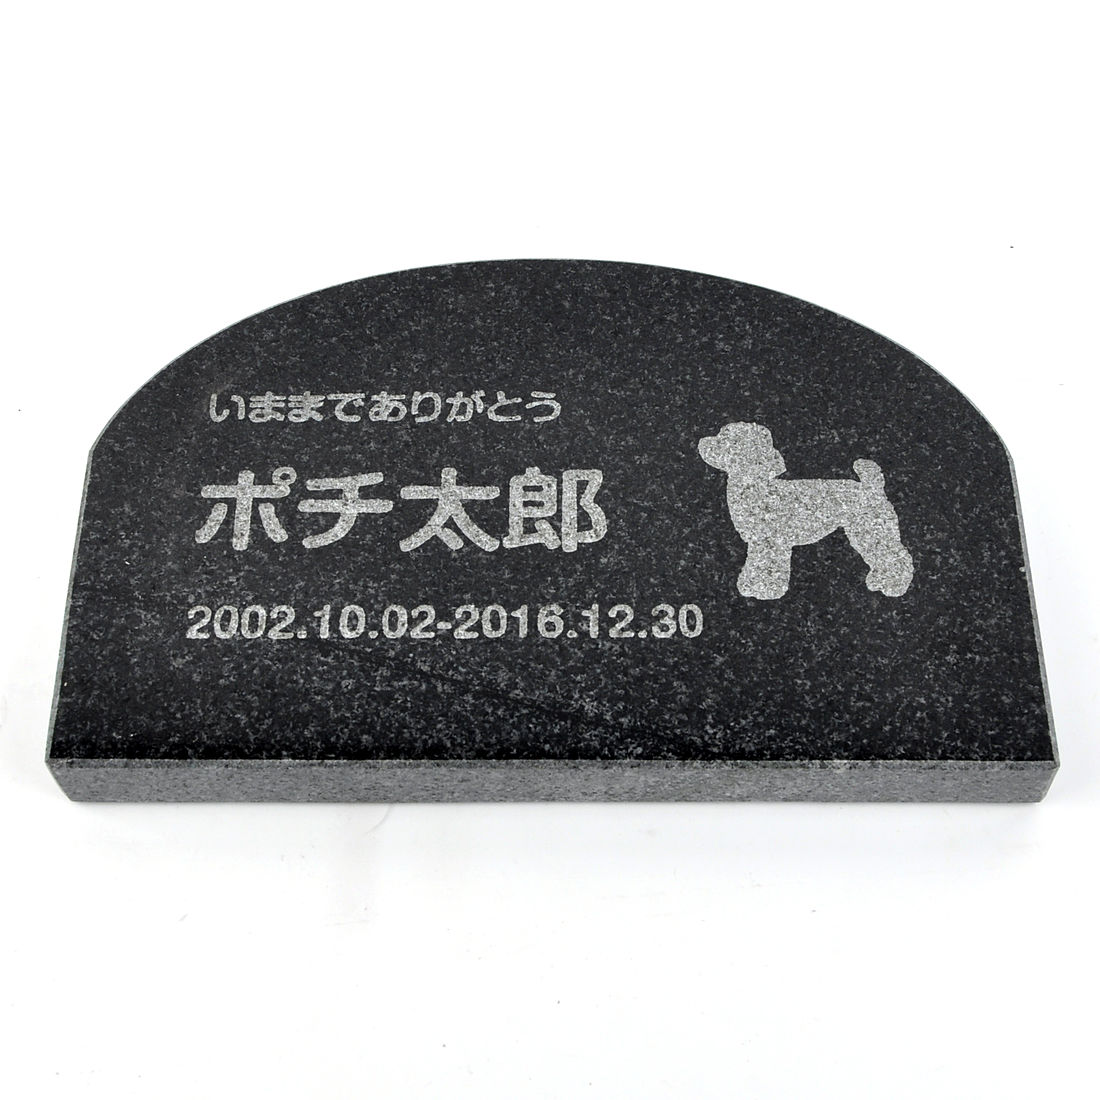 Pet&Love. ペットのお墓 天然石製 シンプル型 御影石 ブラック プレーン アーチ 200x130mm(厚さ20mm)   【HLS_DU】【RCP】【楽ギフ_包装】【楽ギフ_名入れ】 attr130attr ctgr2ctgr sml3sml+ctgr2ctgr DOG